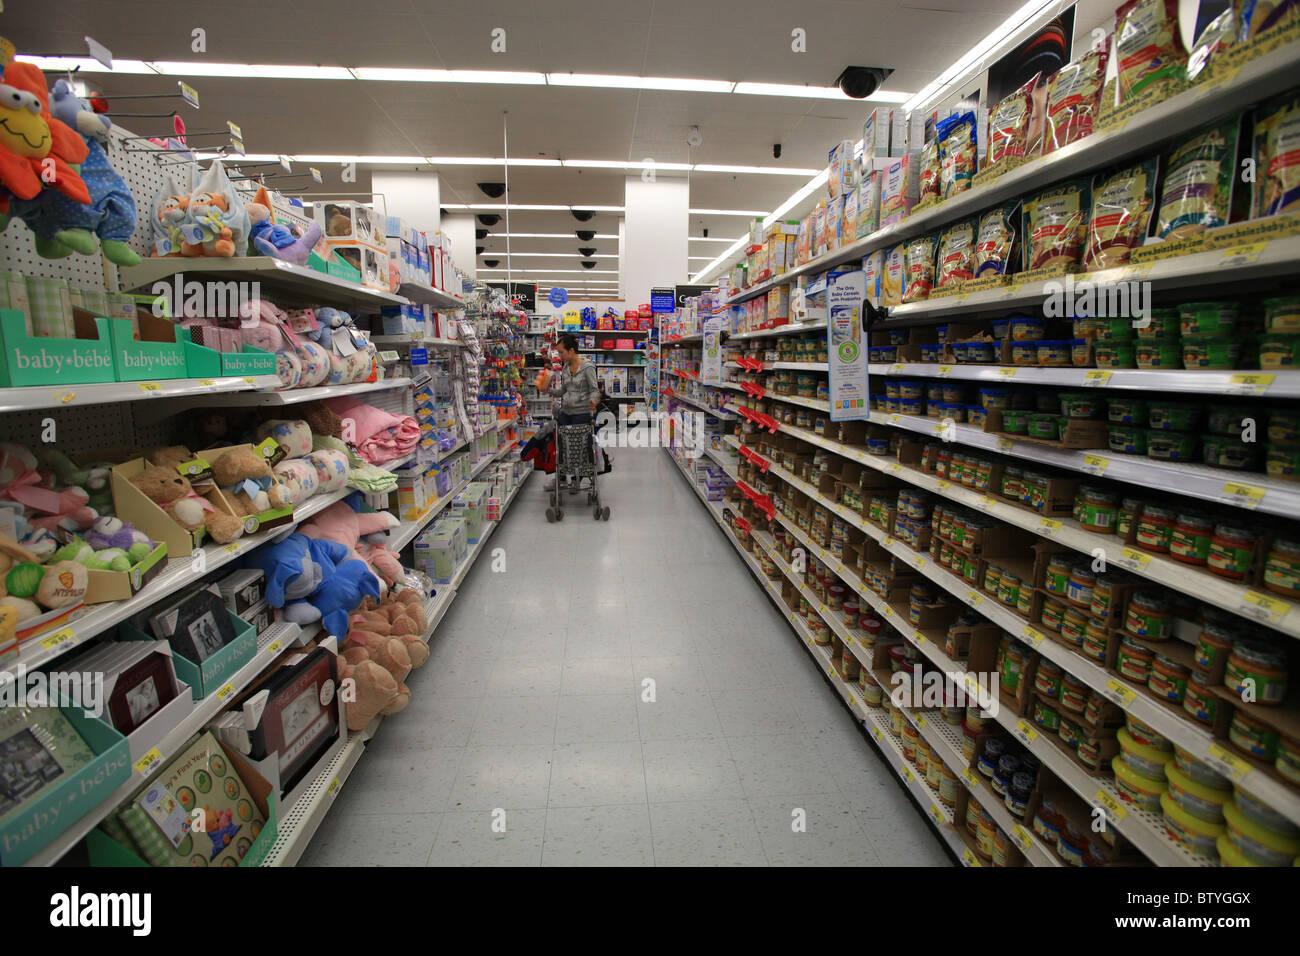 Walmart superstore in Kitchener, Ontario, Canada Stock Photo ...